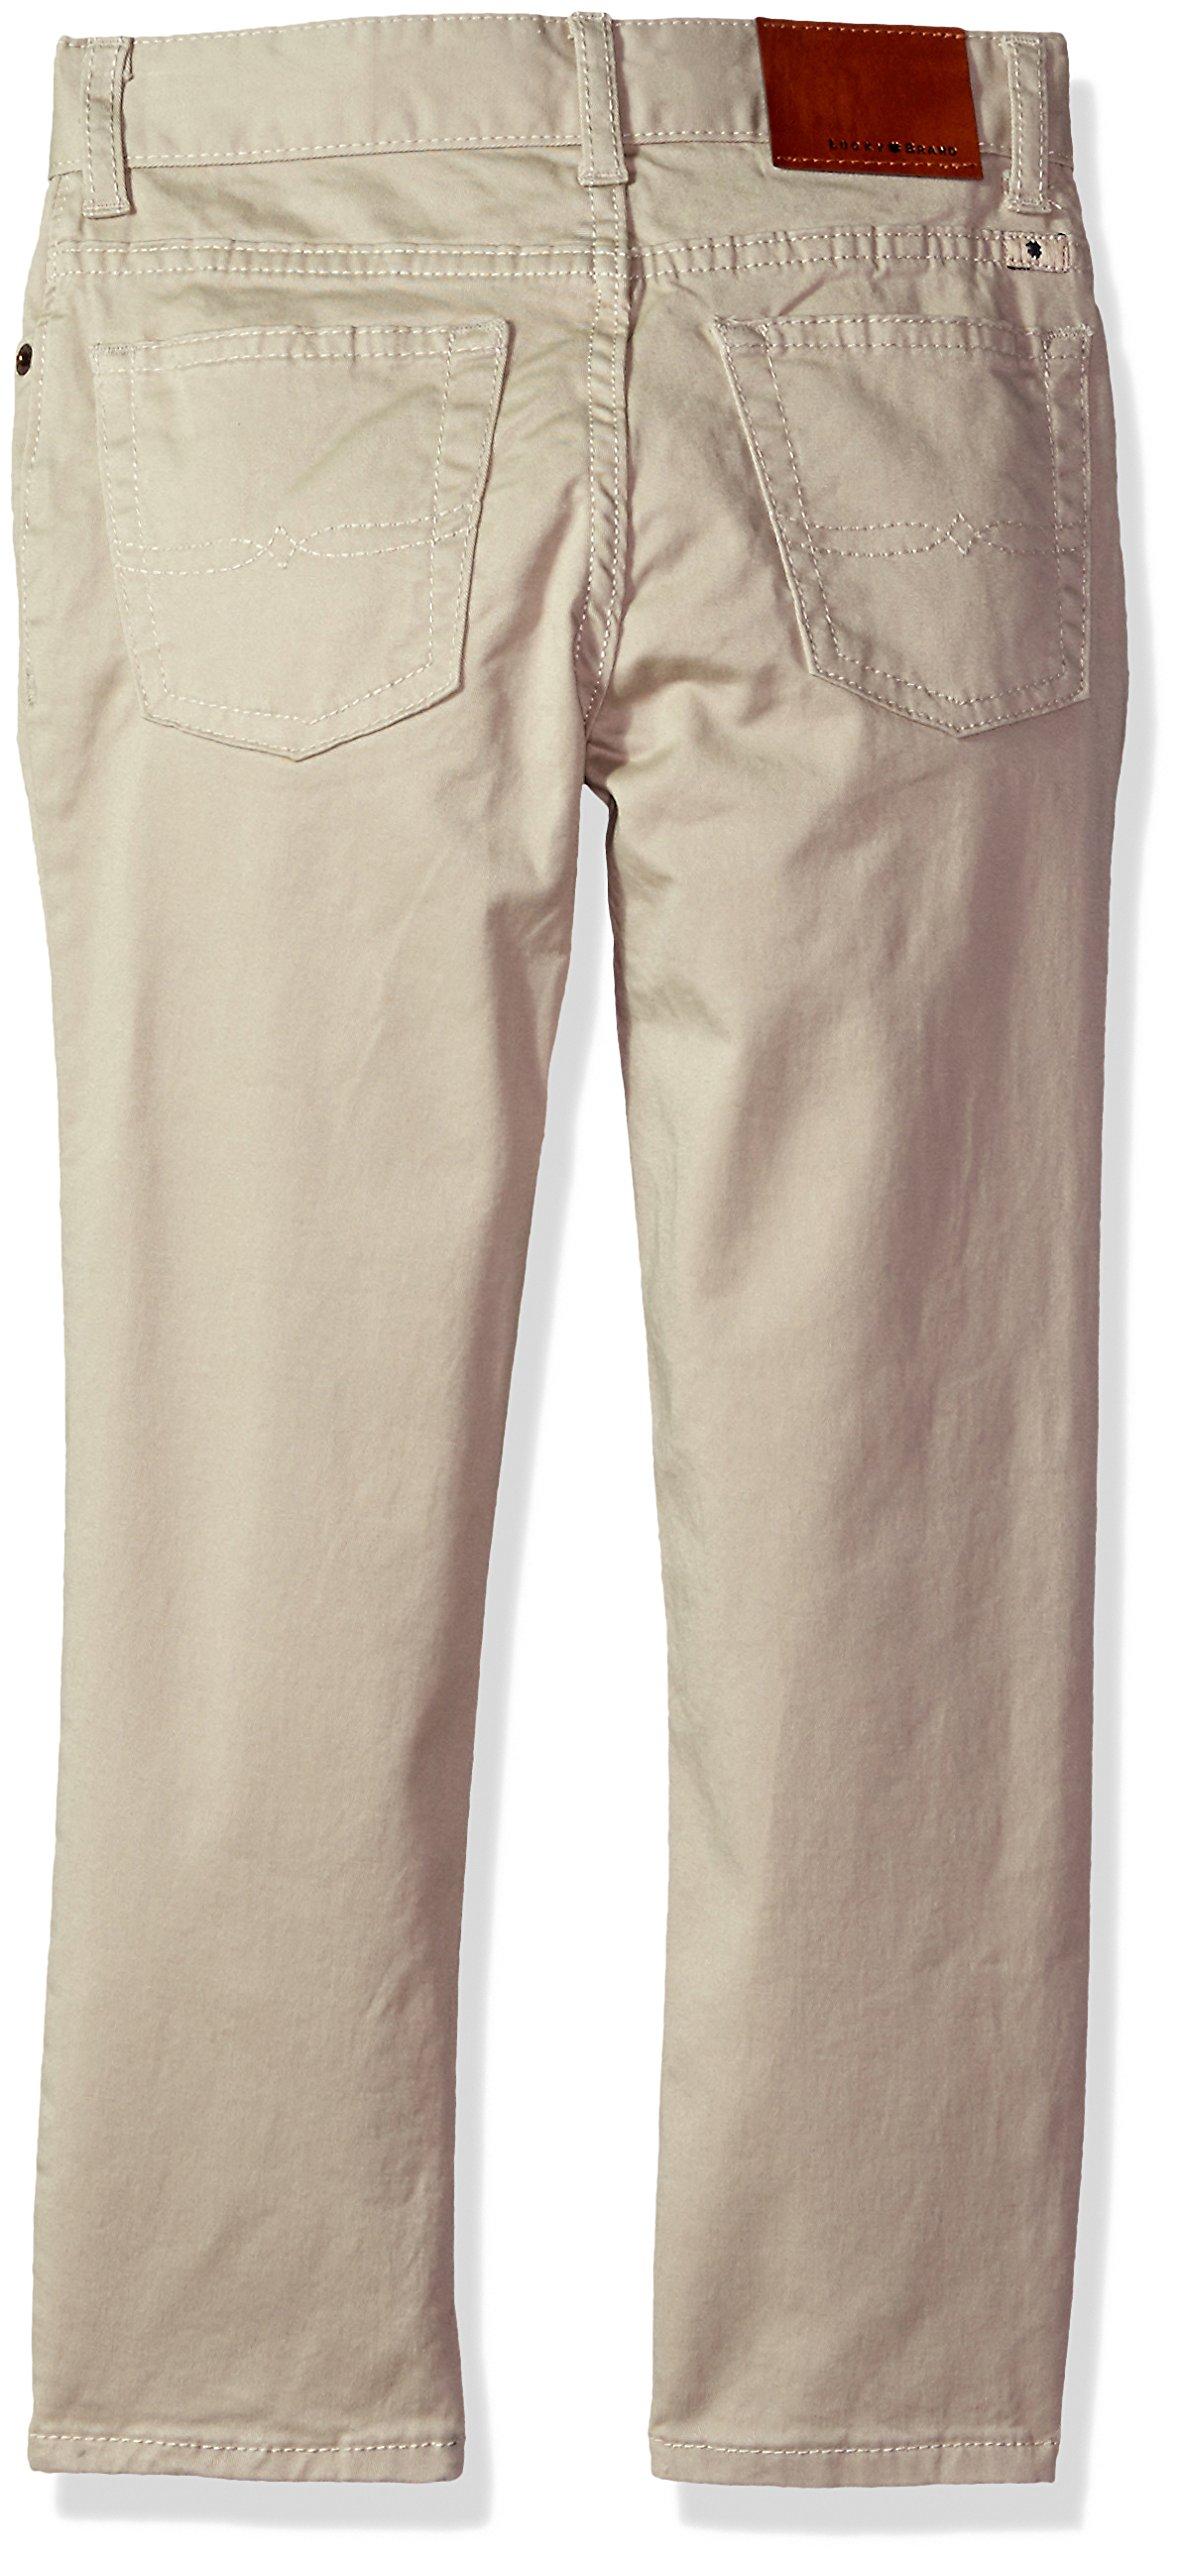 Lucky Brand Big Boys' 5 Pocket Stretch Twill Pant, Light Stone, 8 by Lucky Brand (Image #2)